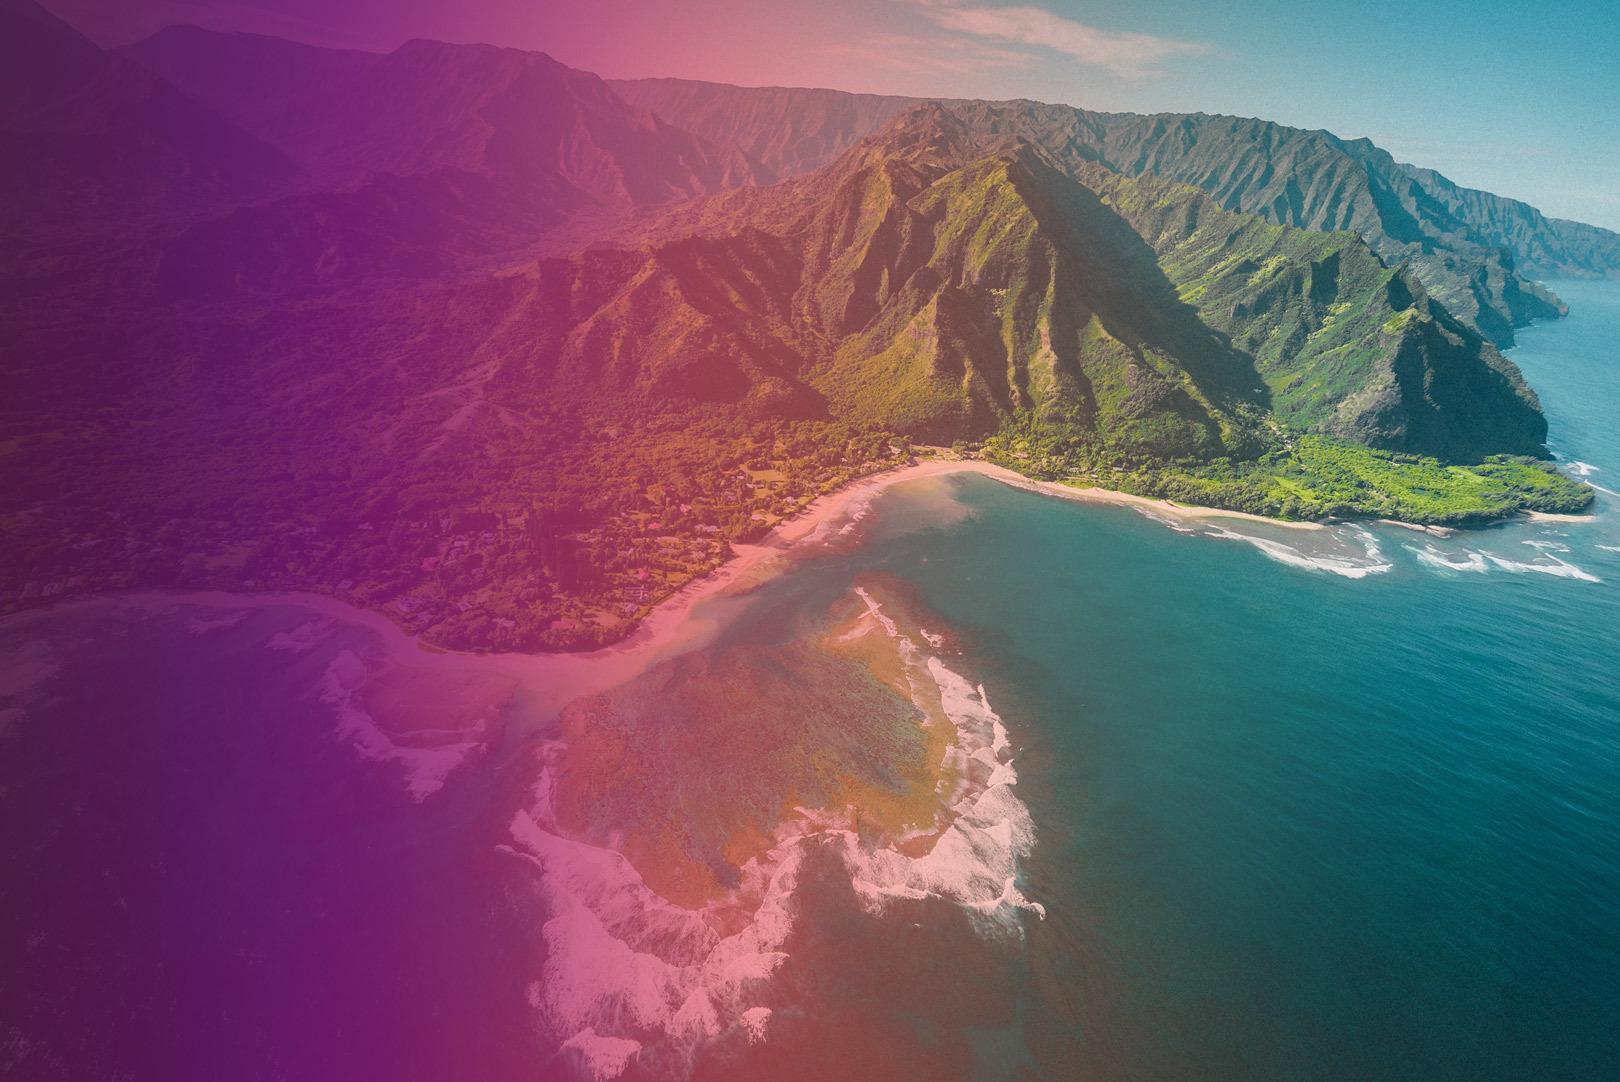 Image of 022621 Lumedic Hawaii with Overlay